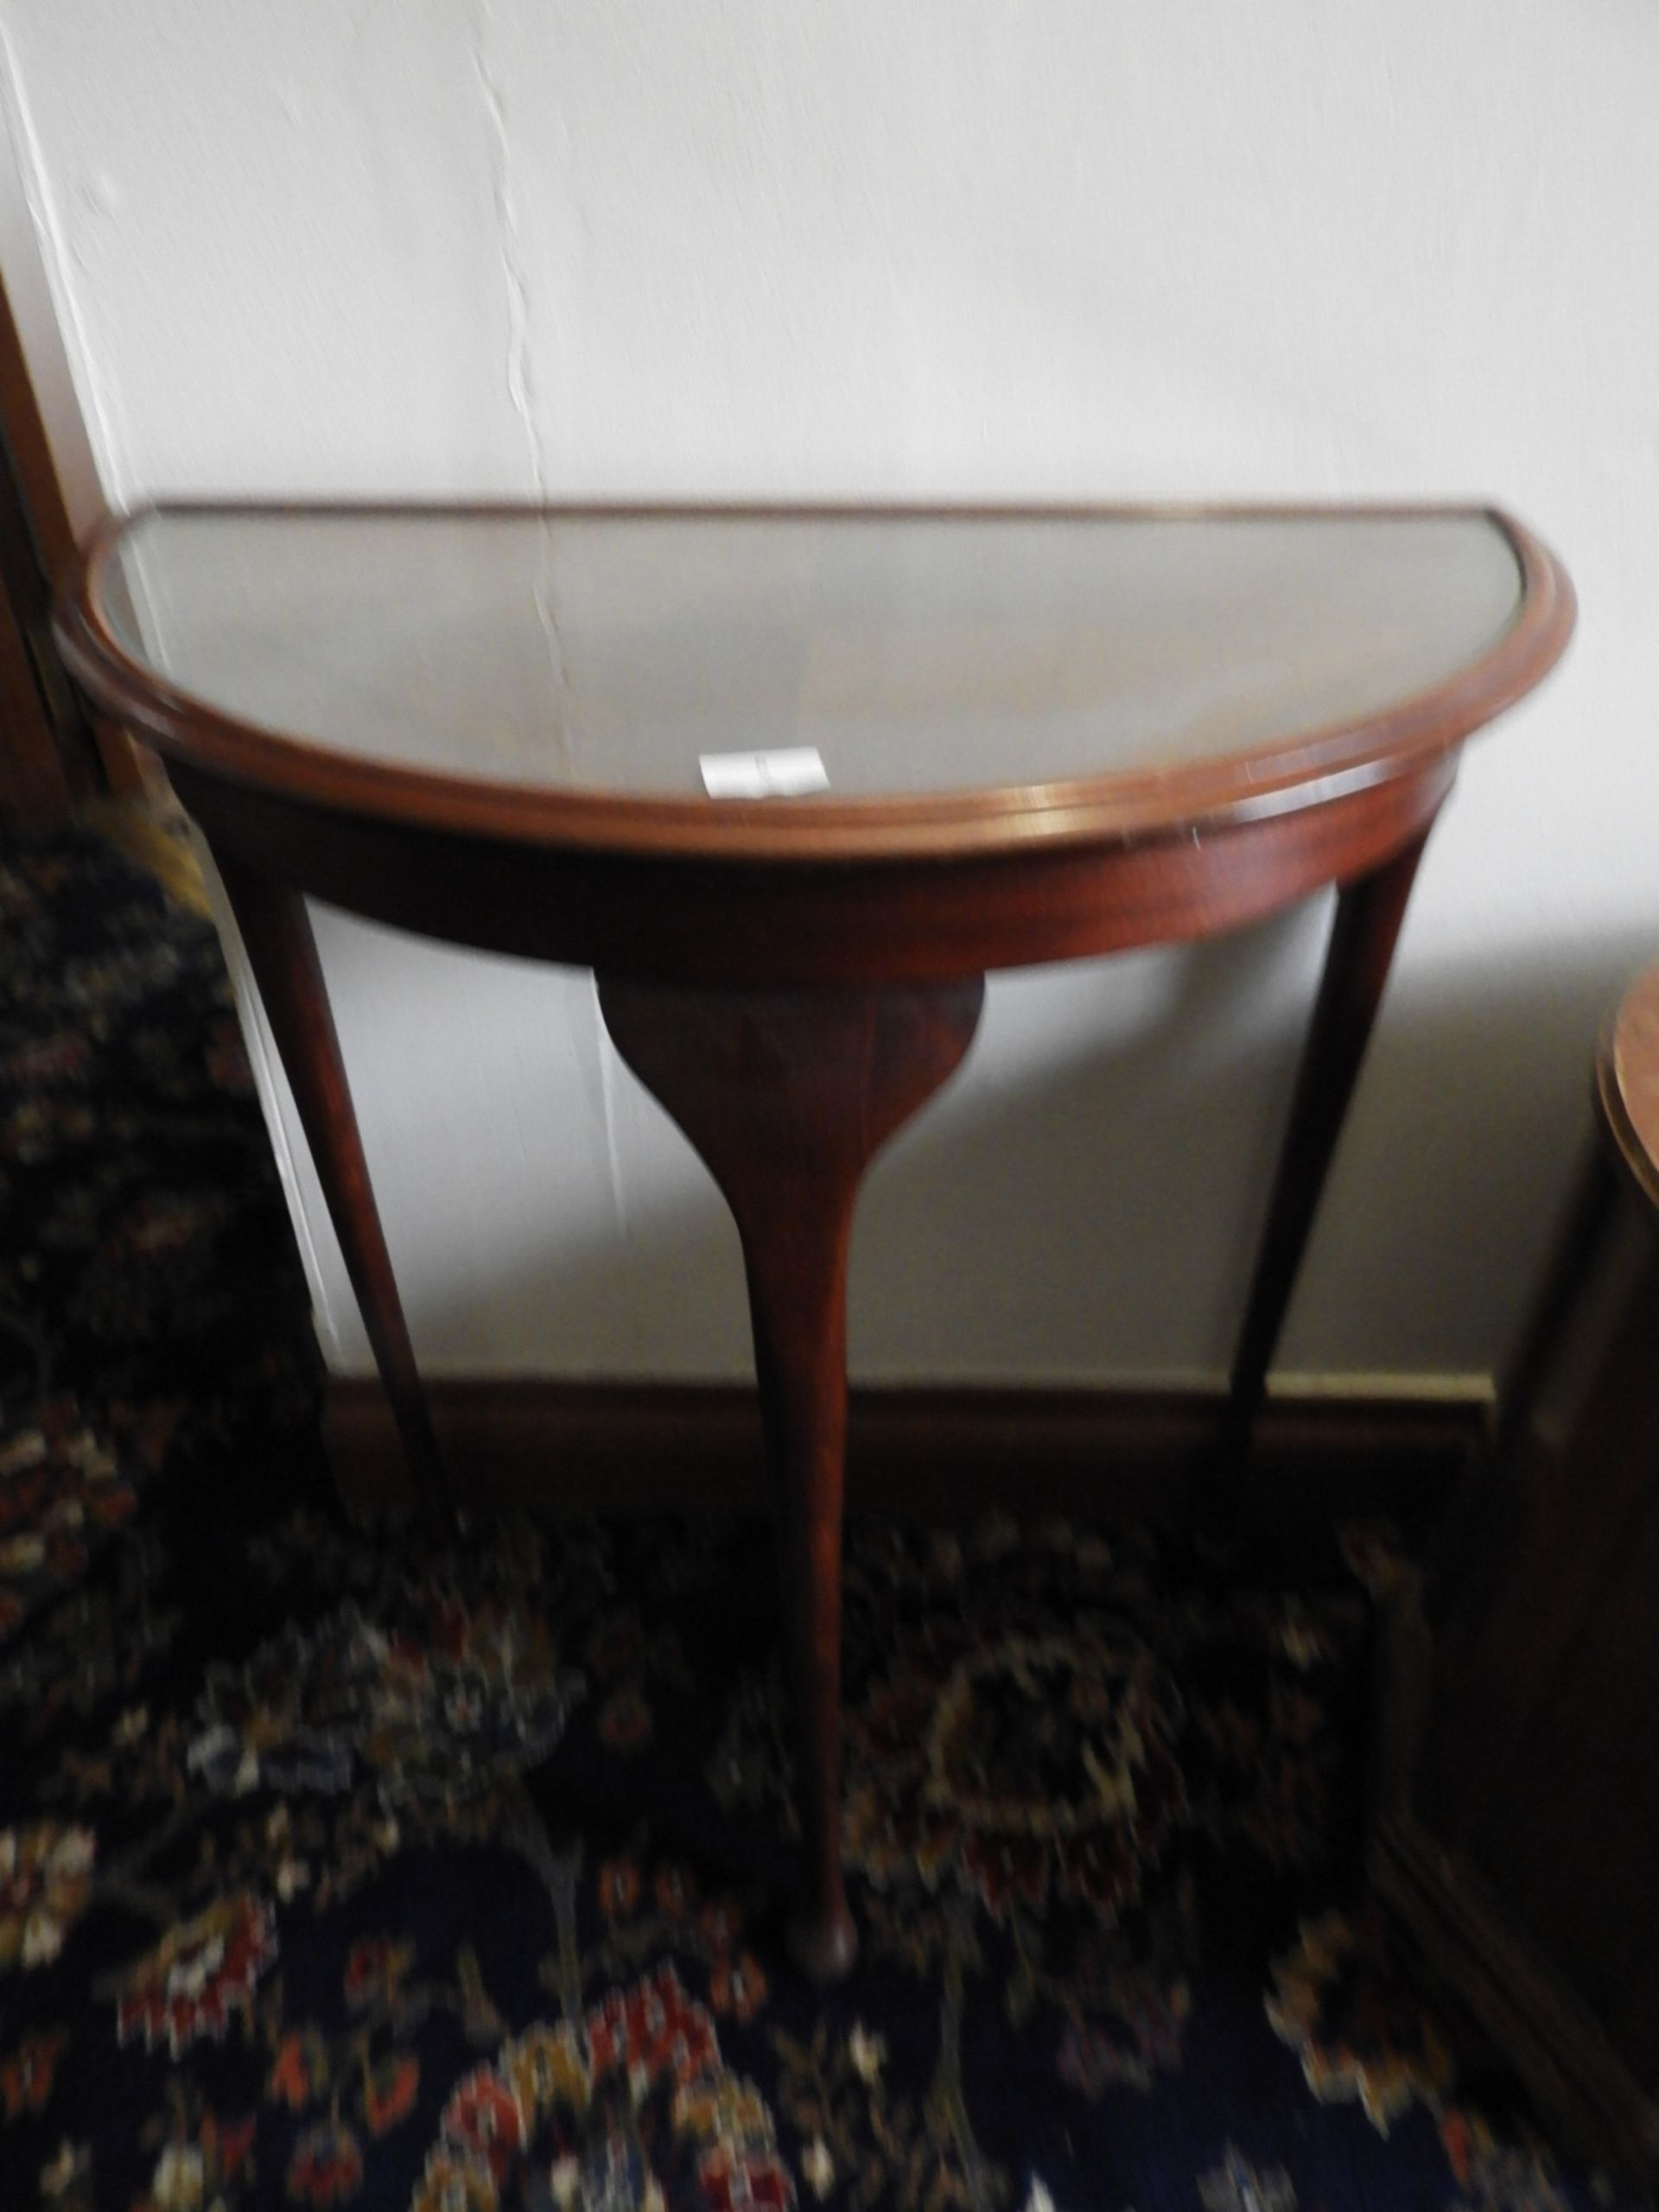 Lot 6 - *Demilune Mahogany Hall Table on Cabriole Legs